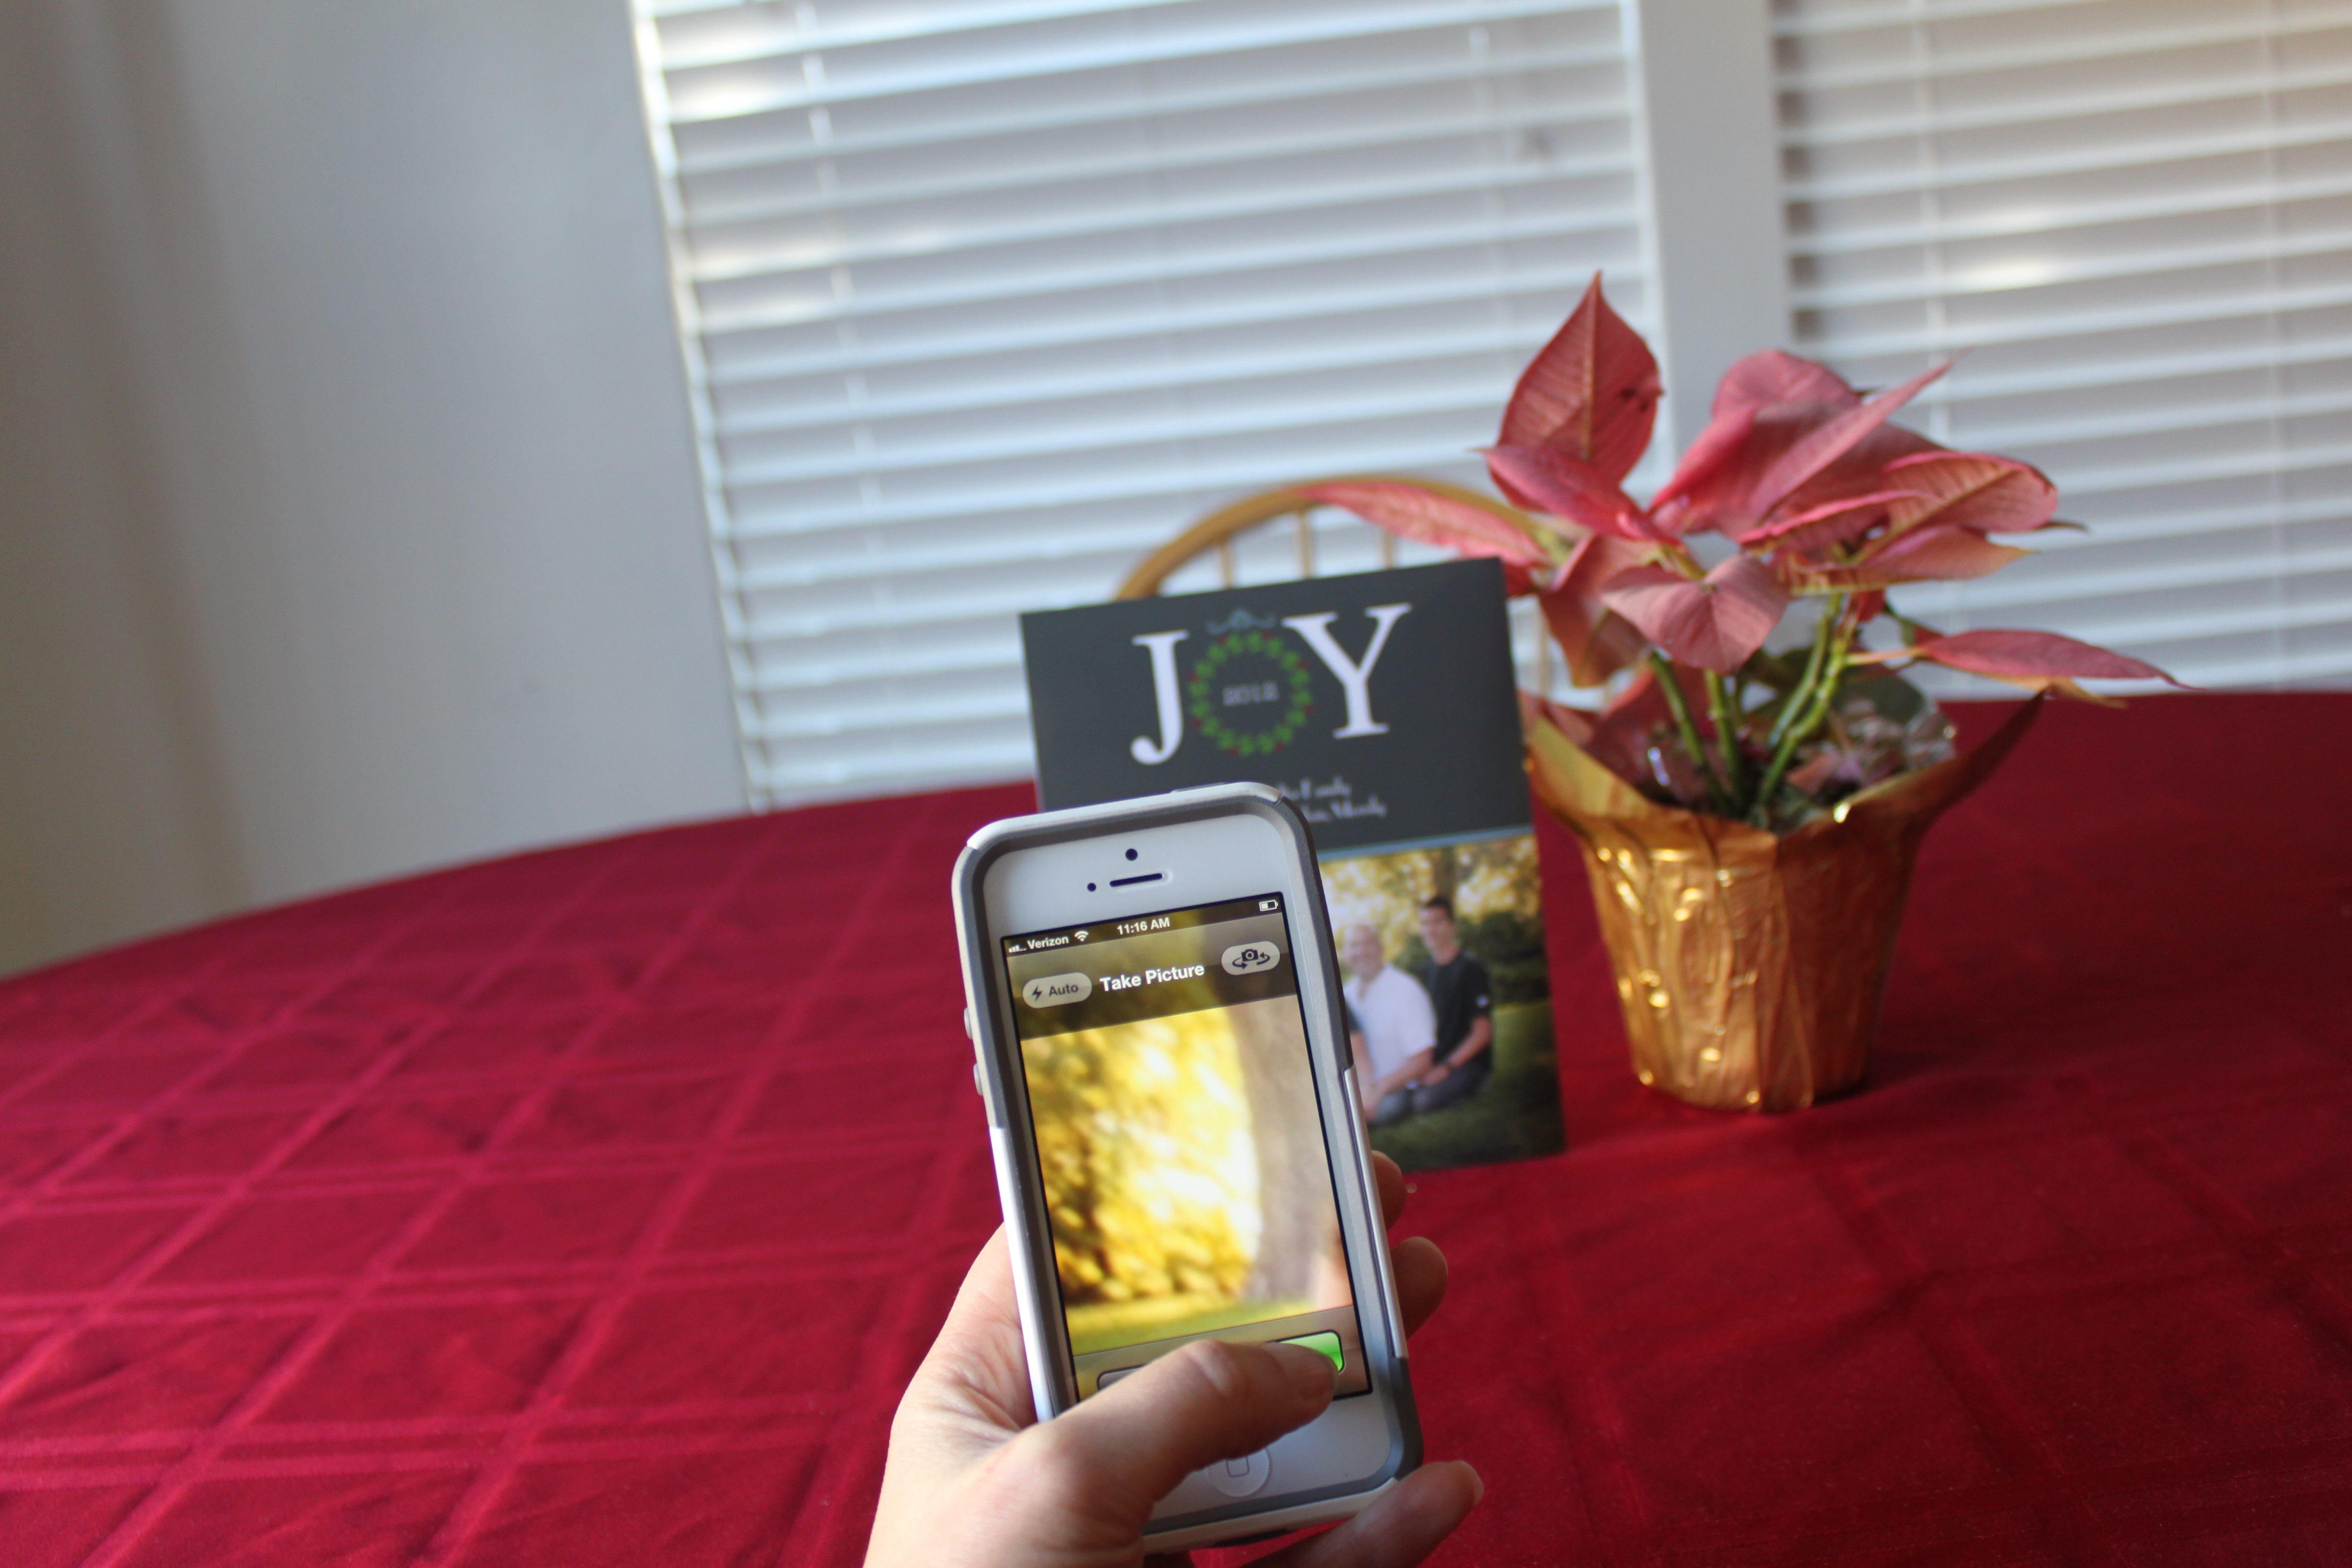 Ipod christmas card contact photos 014